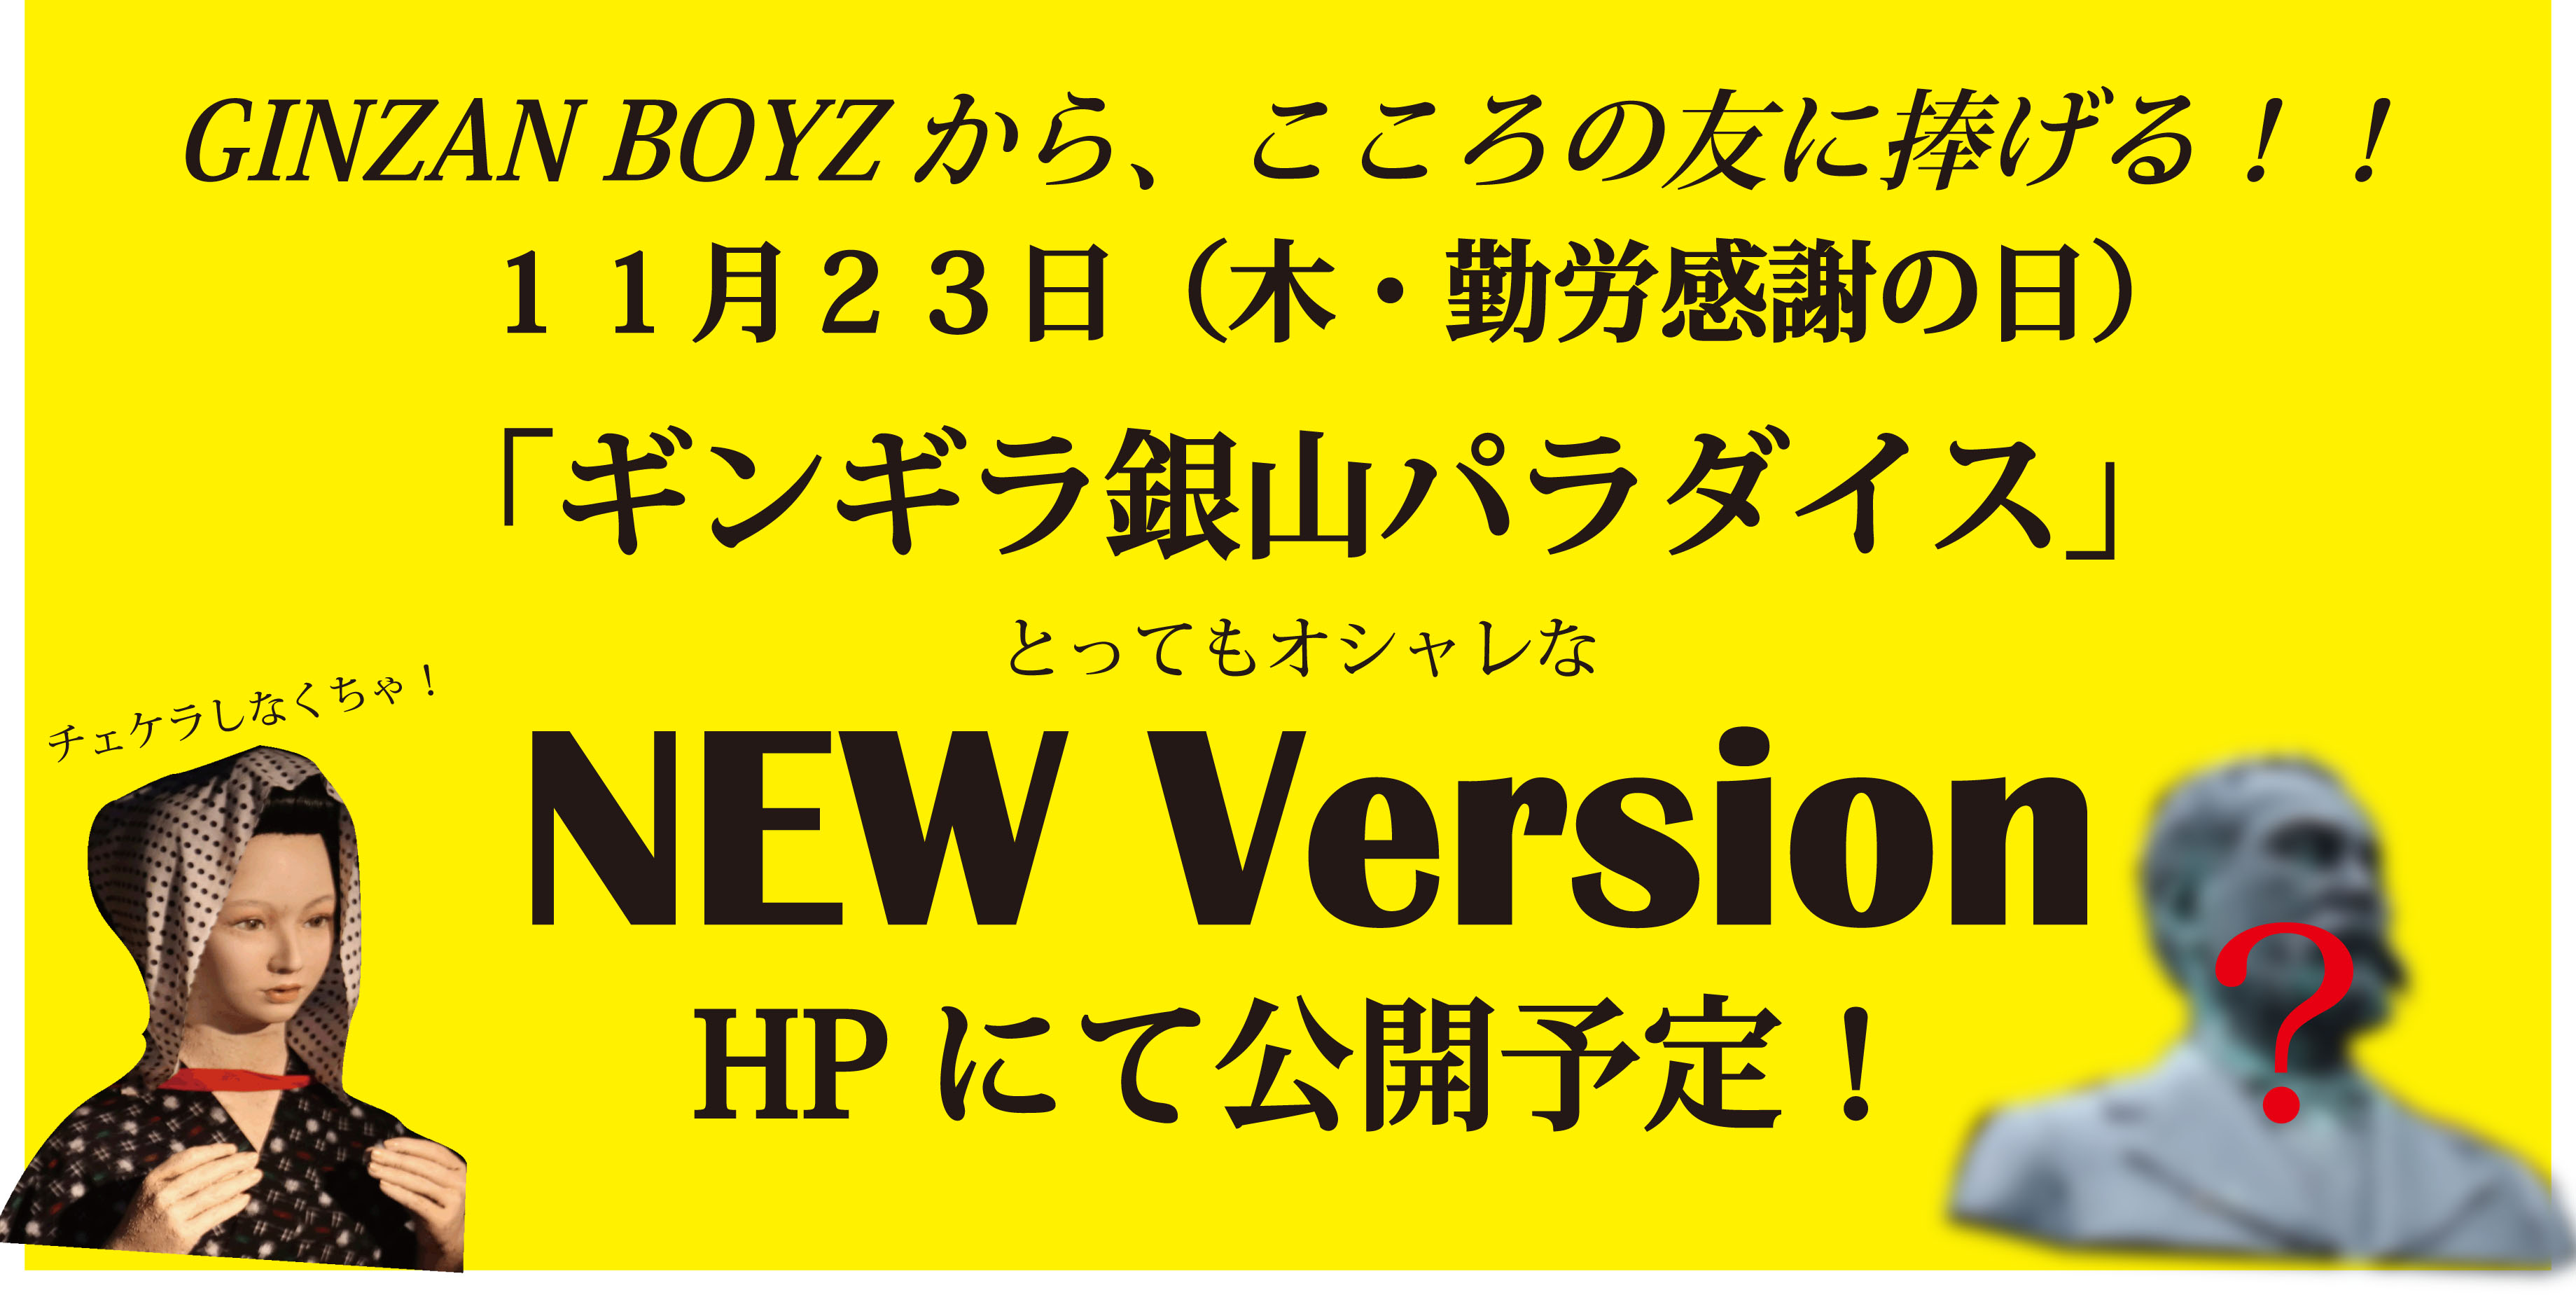 <font face=Meyrio>GINZAN BOYZの『ギンギラ銀山パラダイス』に新バージョン?!</font>